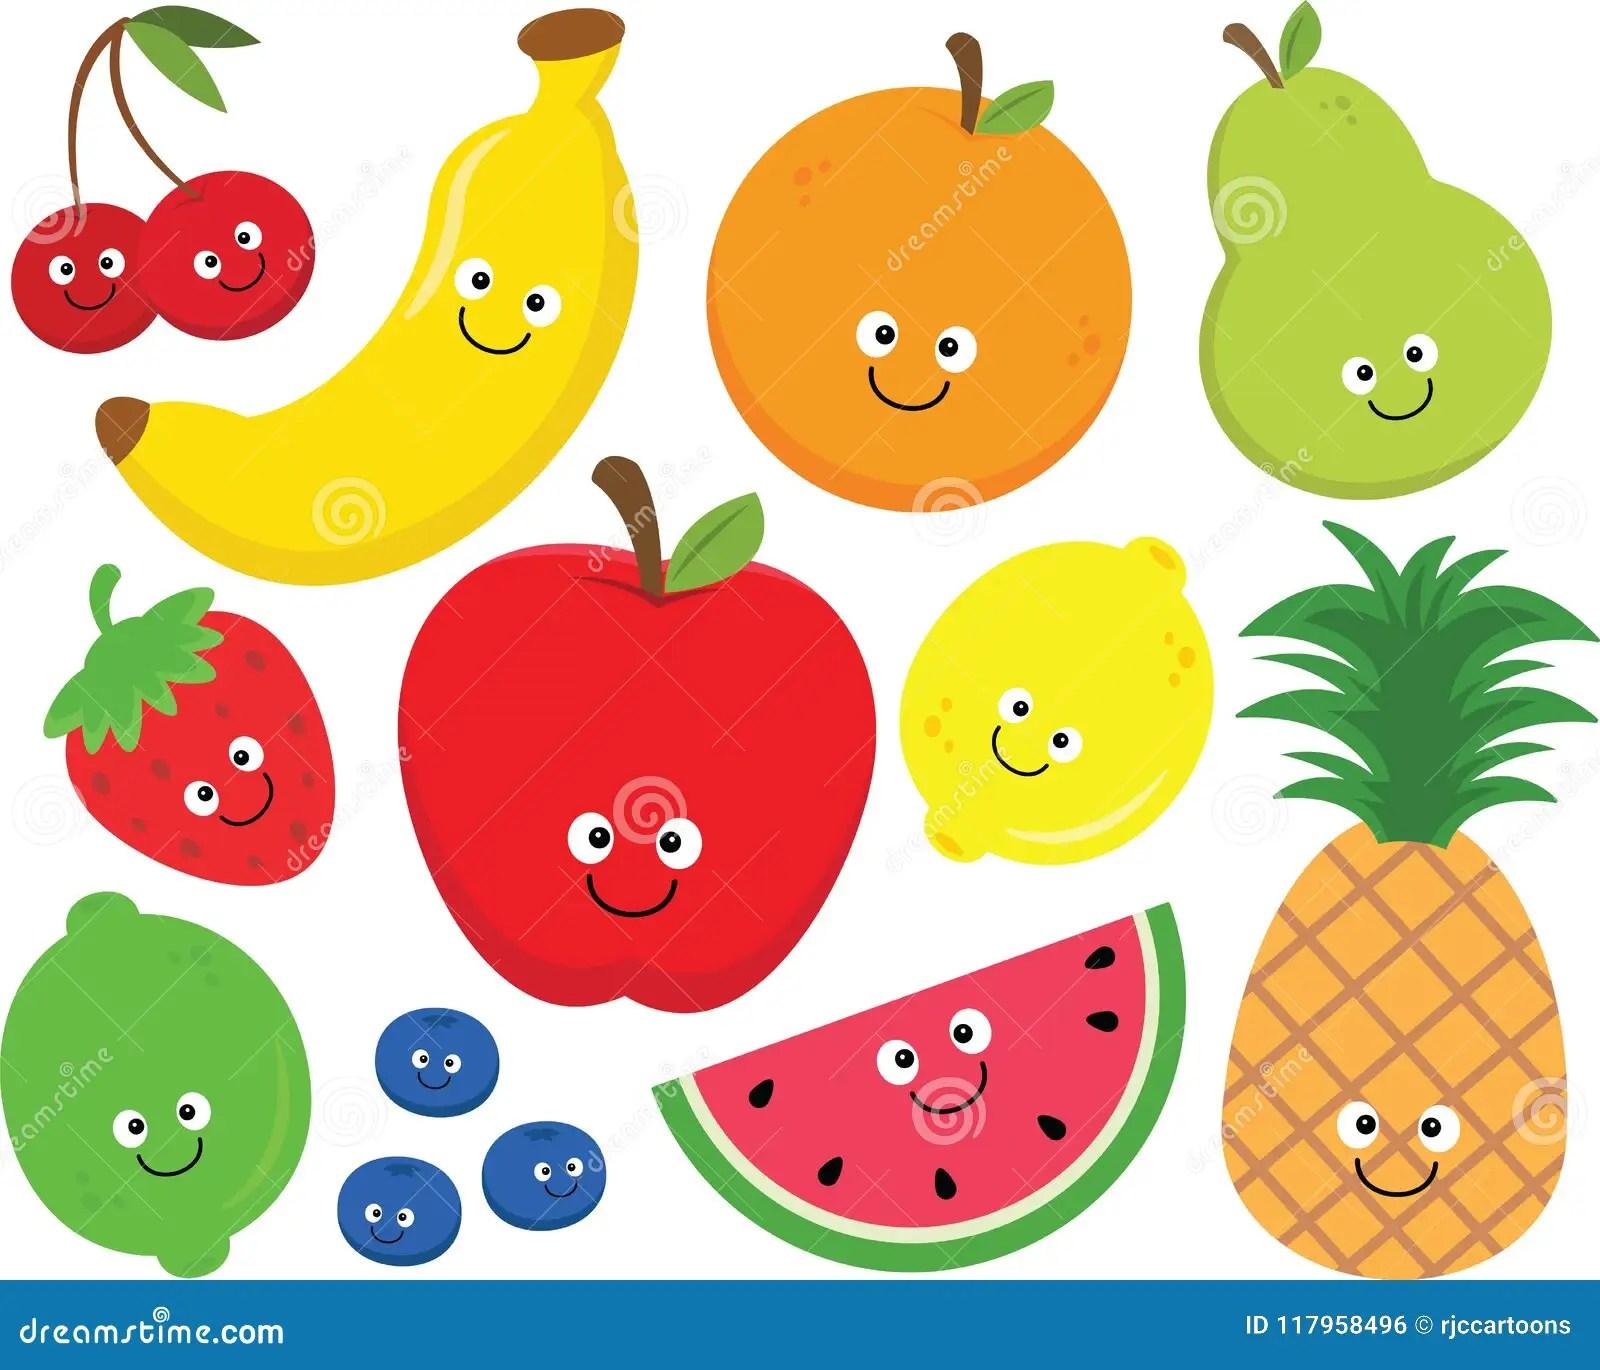 hight resolution of set of happy cartoon fruit clipart